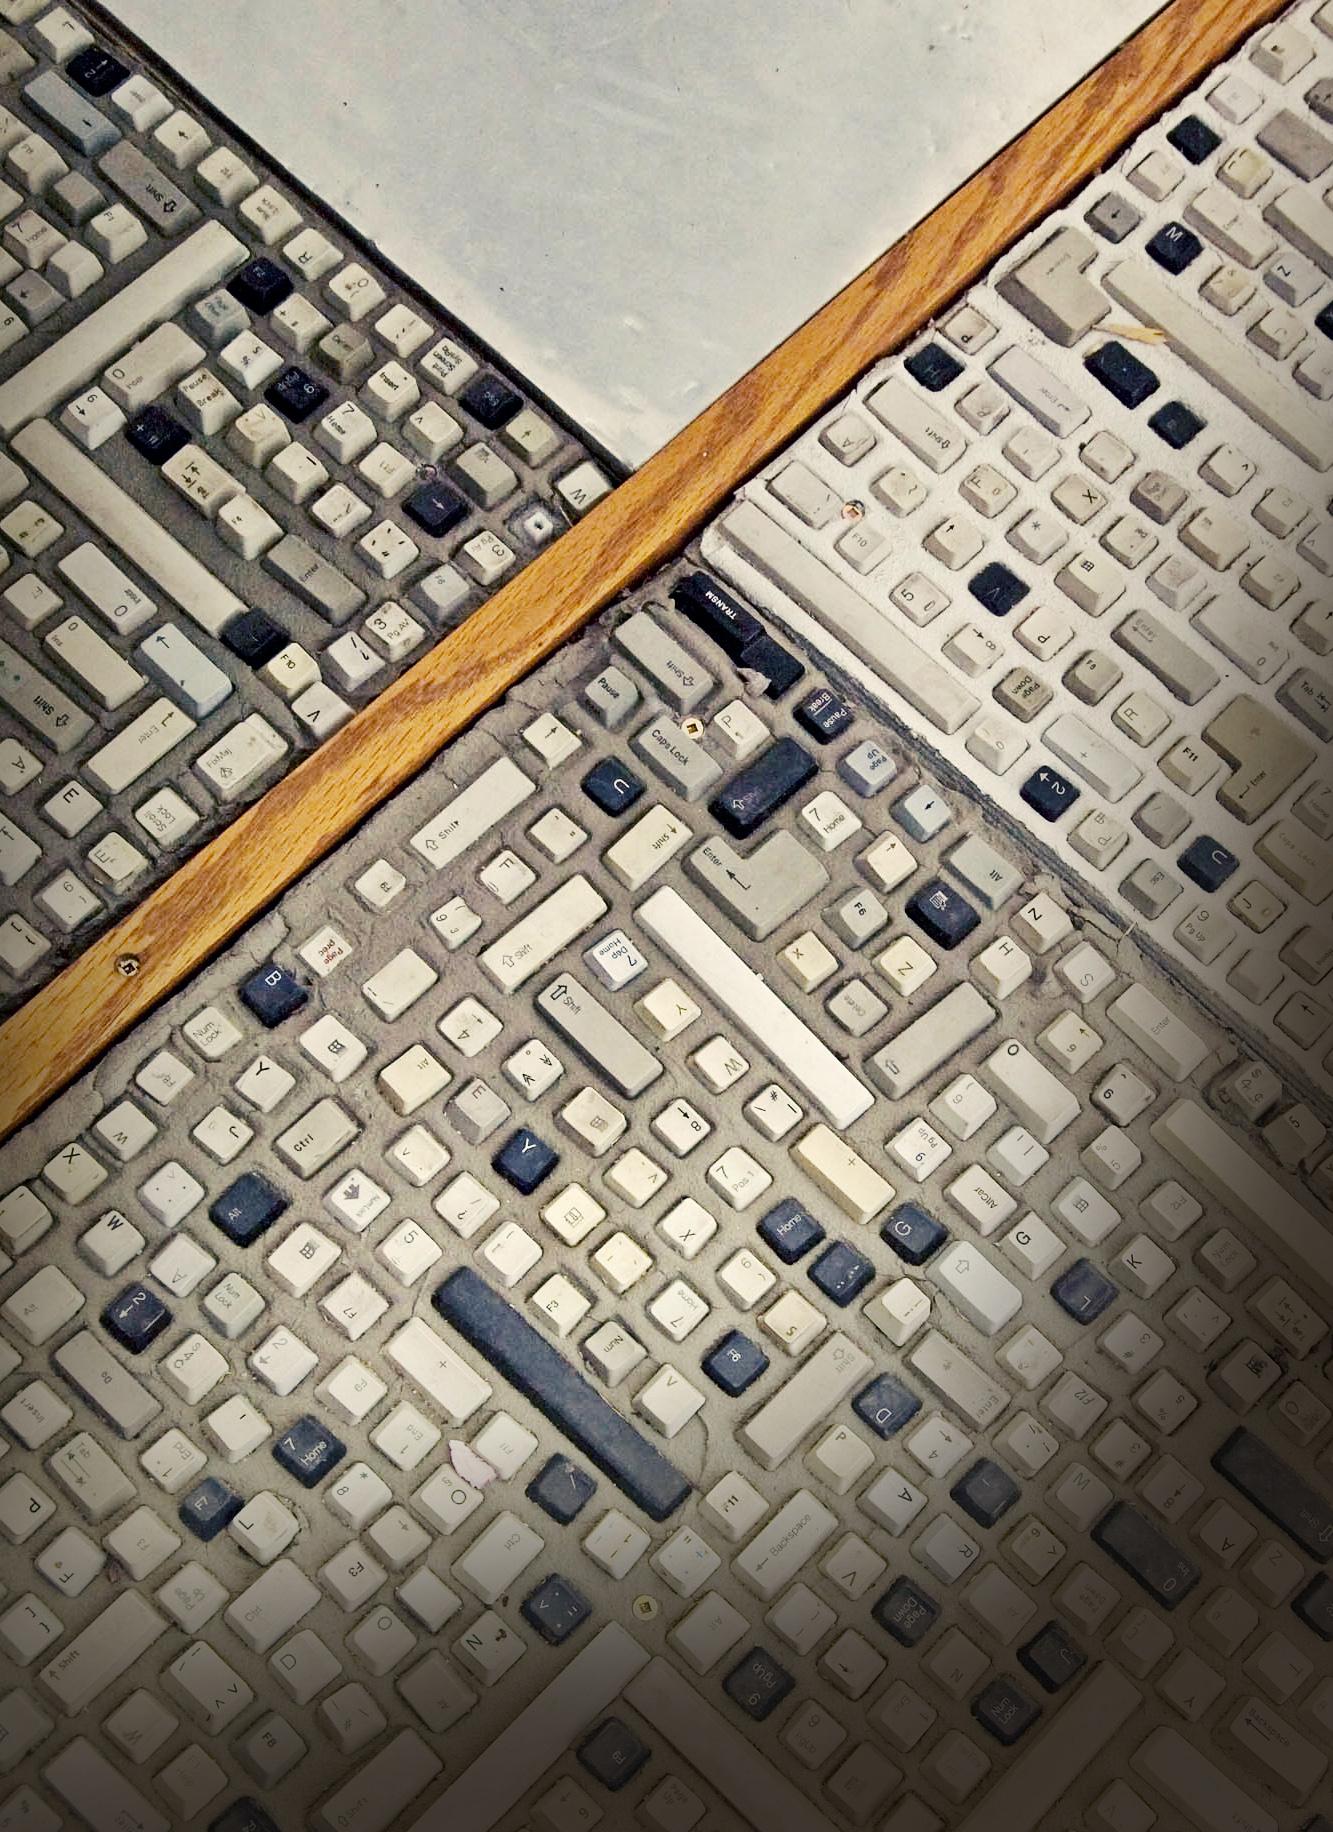 Espace Sedna - Mozaïque de claviers